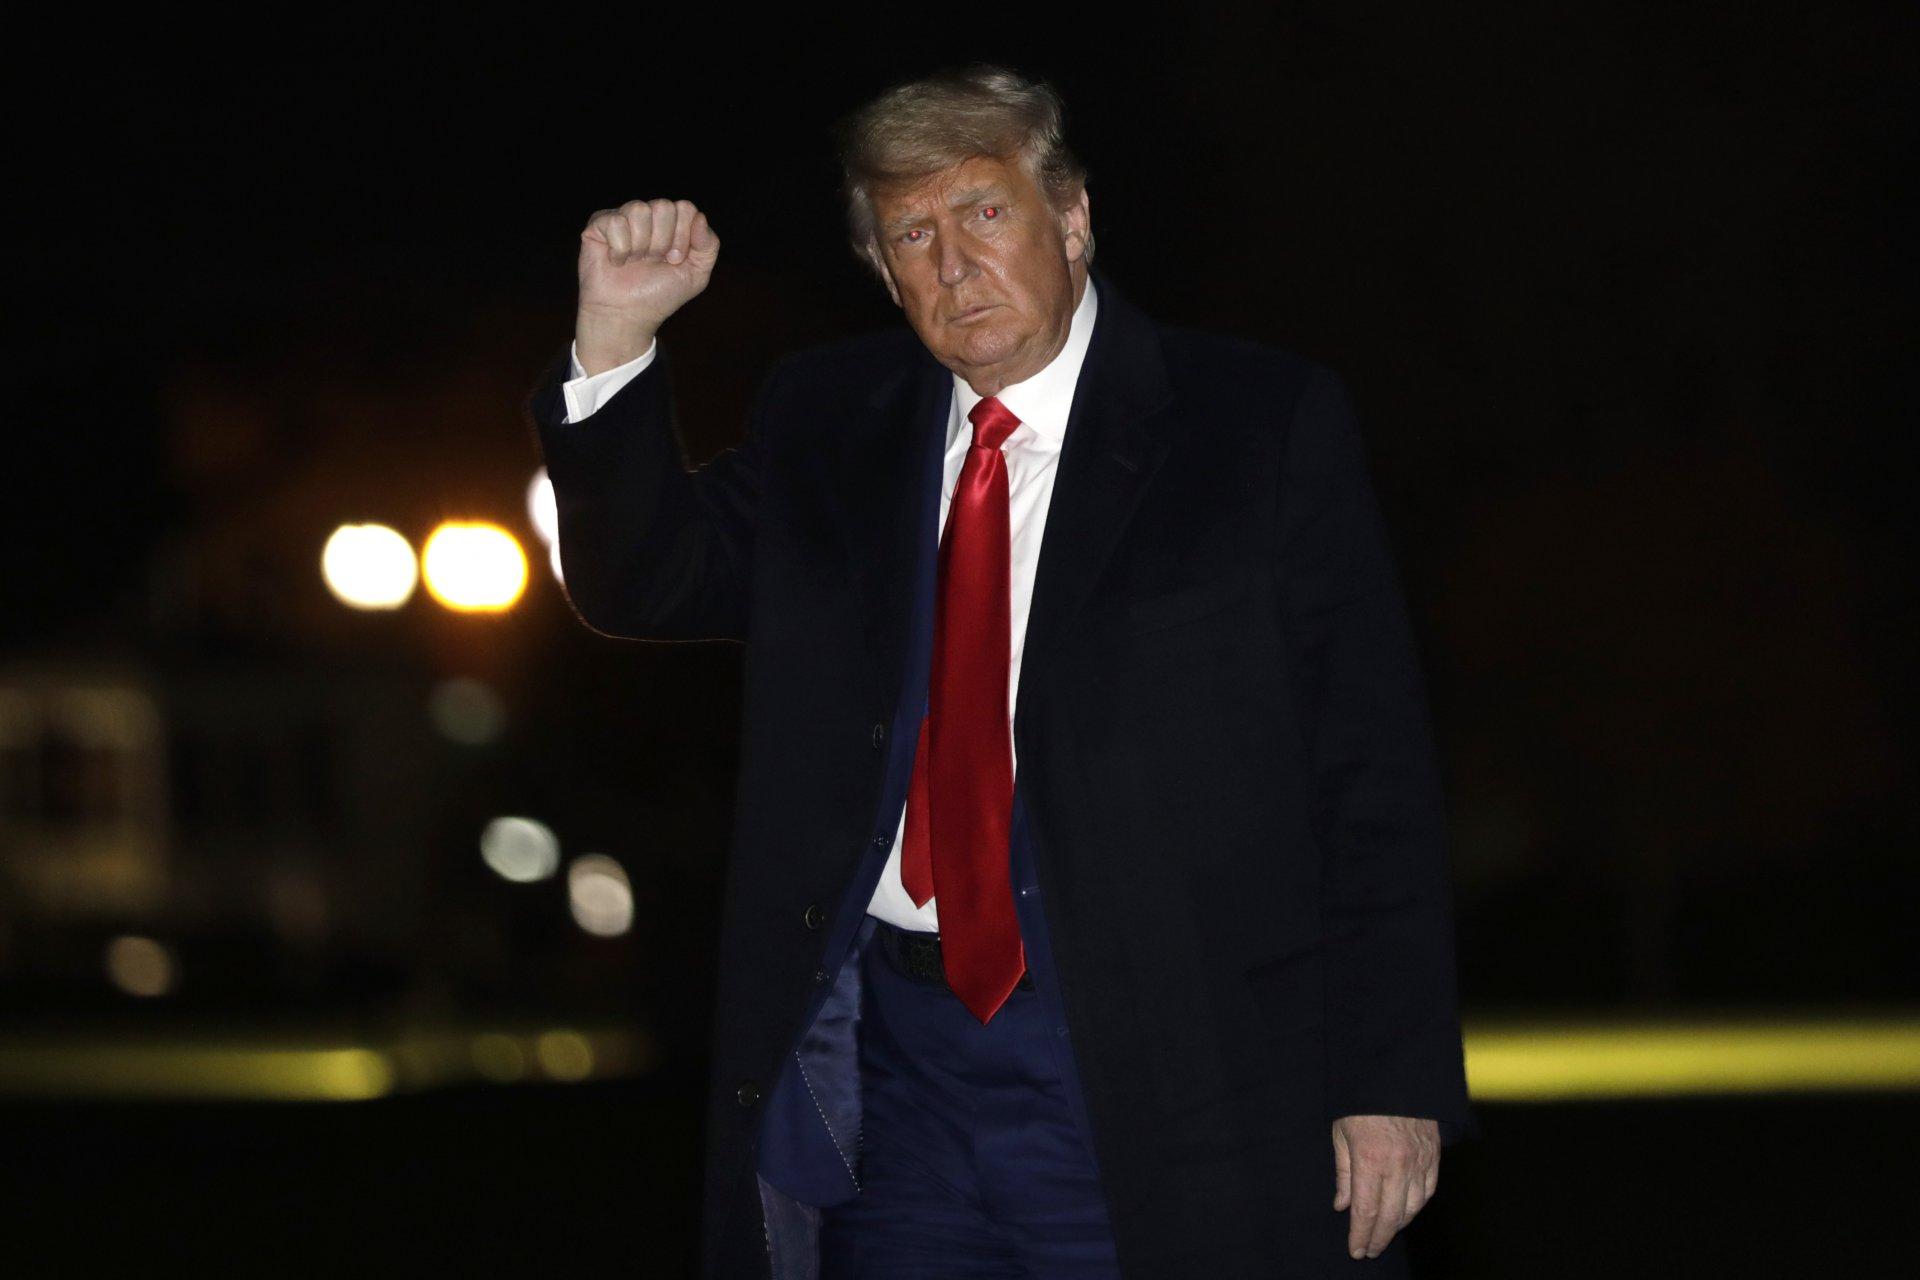 Mandatory Credit: Photo by Shutterstock (11540065c)United States President Donald J.